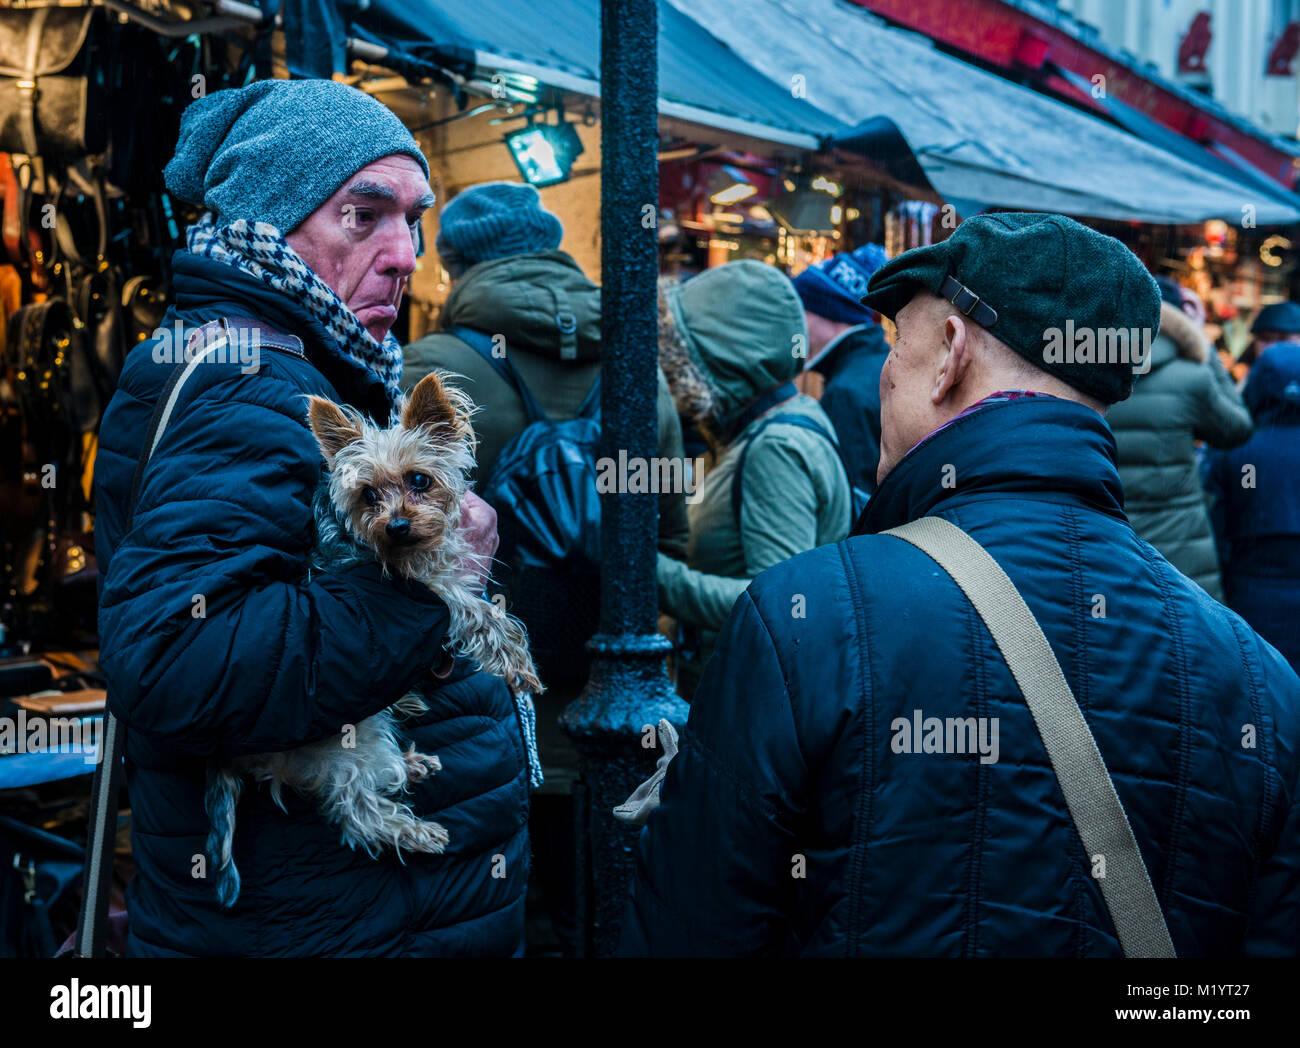 Two men face to face, one holding dog, Portobello, London, England - Stock Image